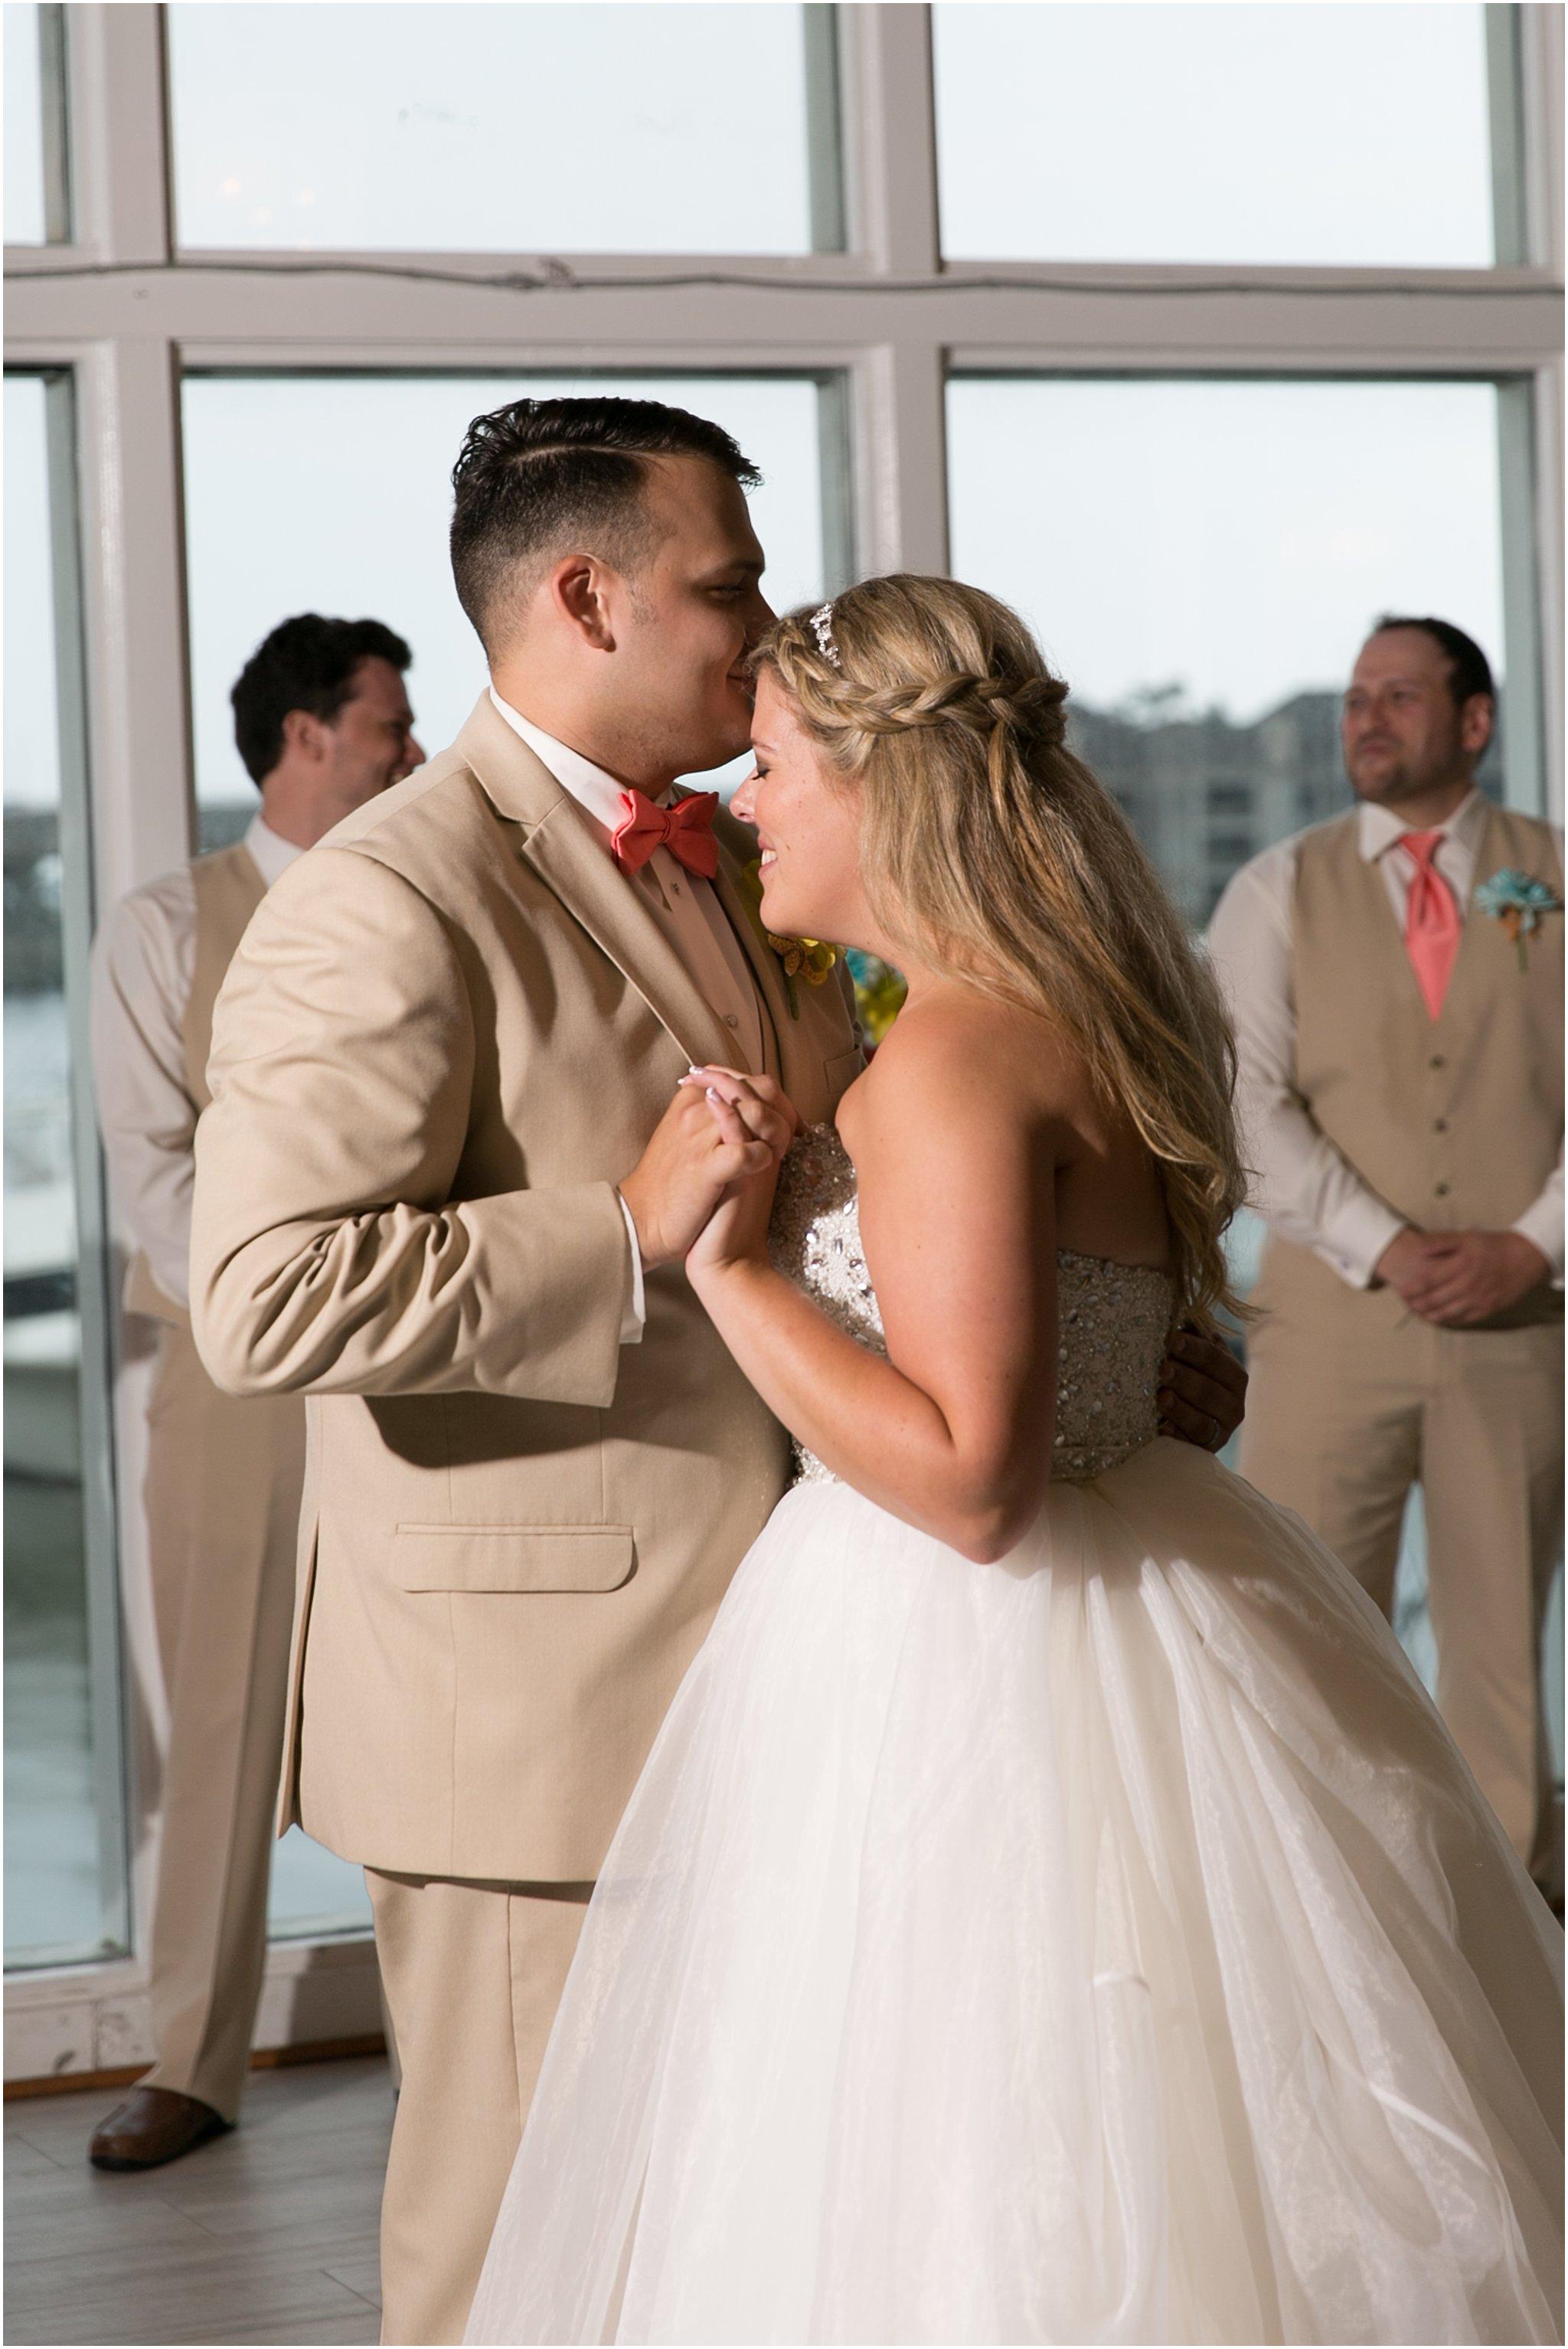 jessica_ryan_photography_wedding_hampton_roads_virginia_virginia_beach_weddings_0629